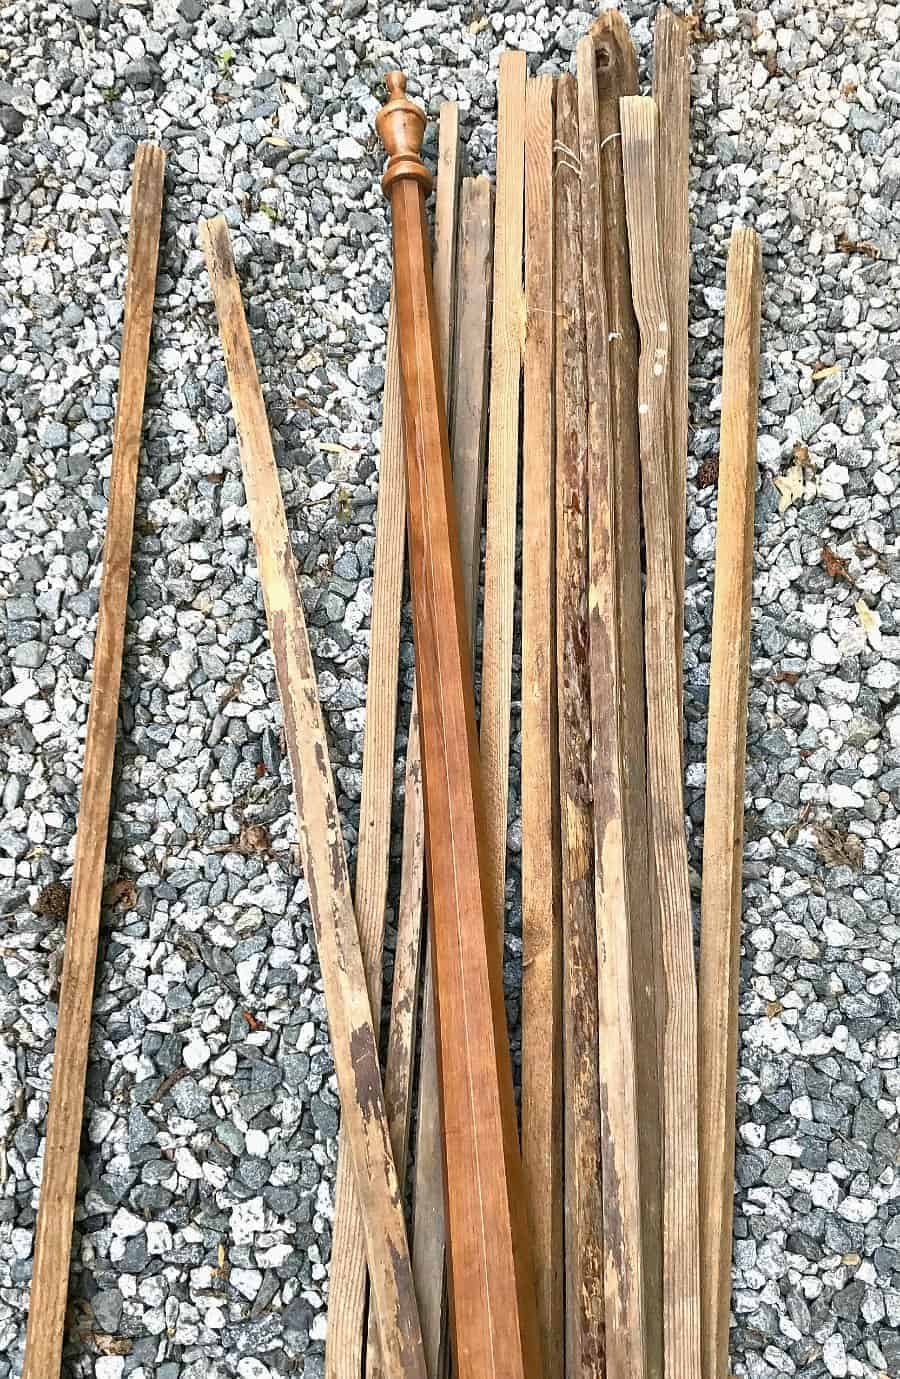 scrap wood tobacco sticks laying on the stone driveway